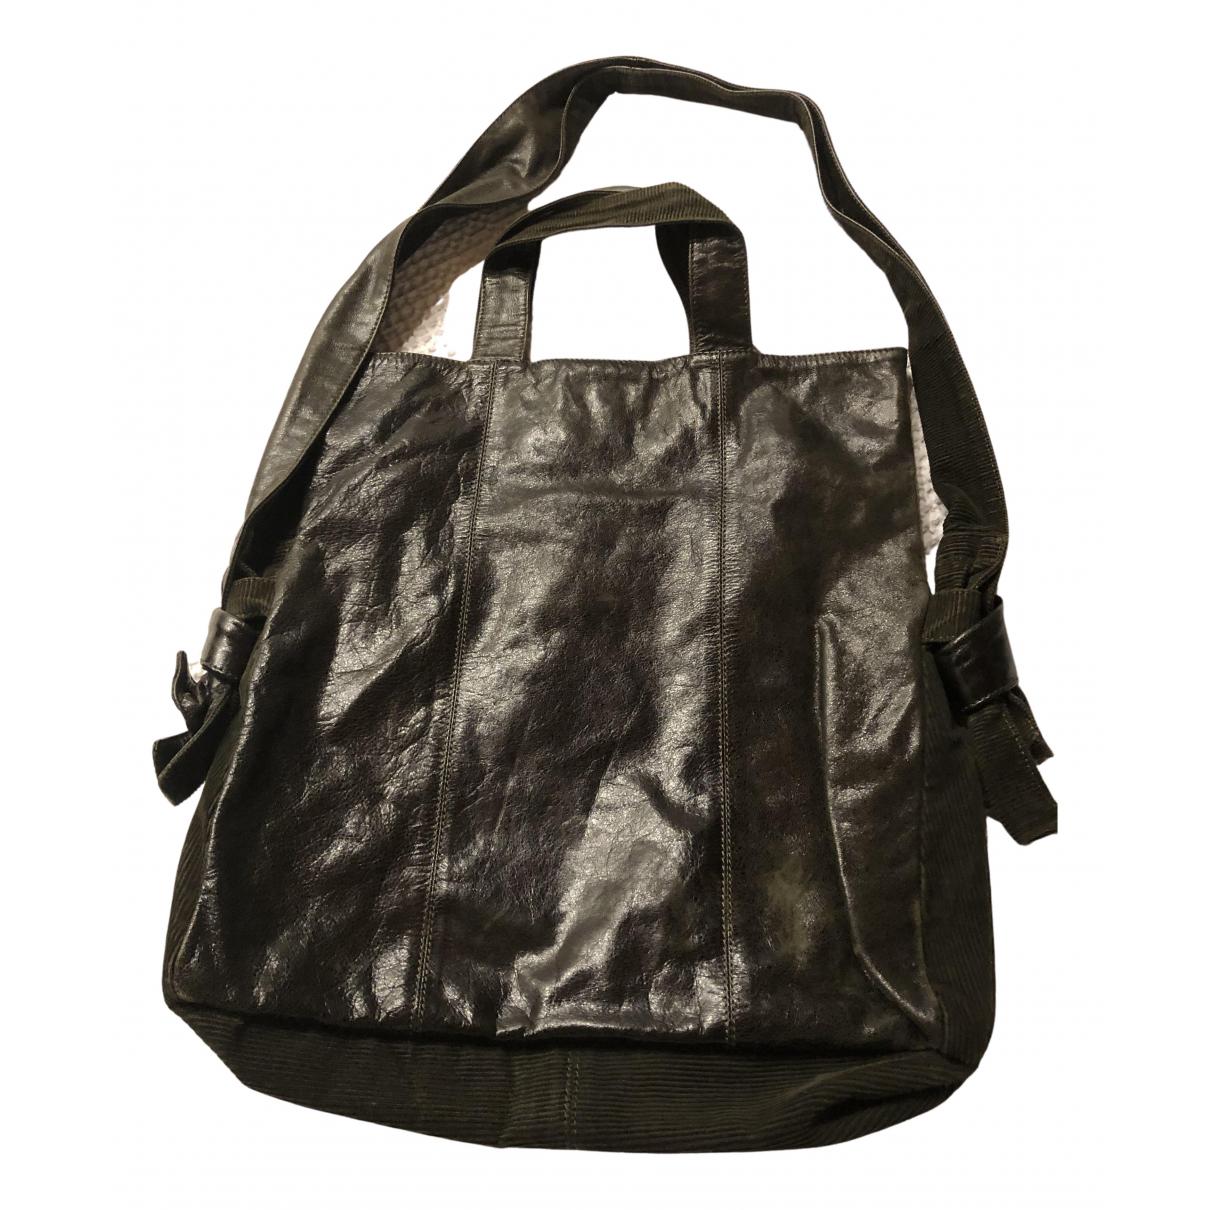 Max & Co N Green Leather handbag for Women N